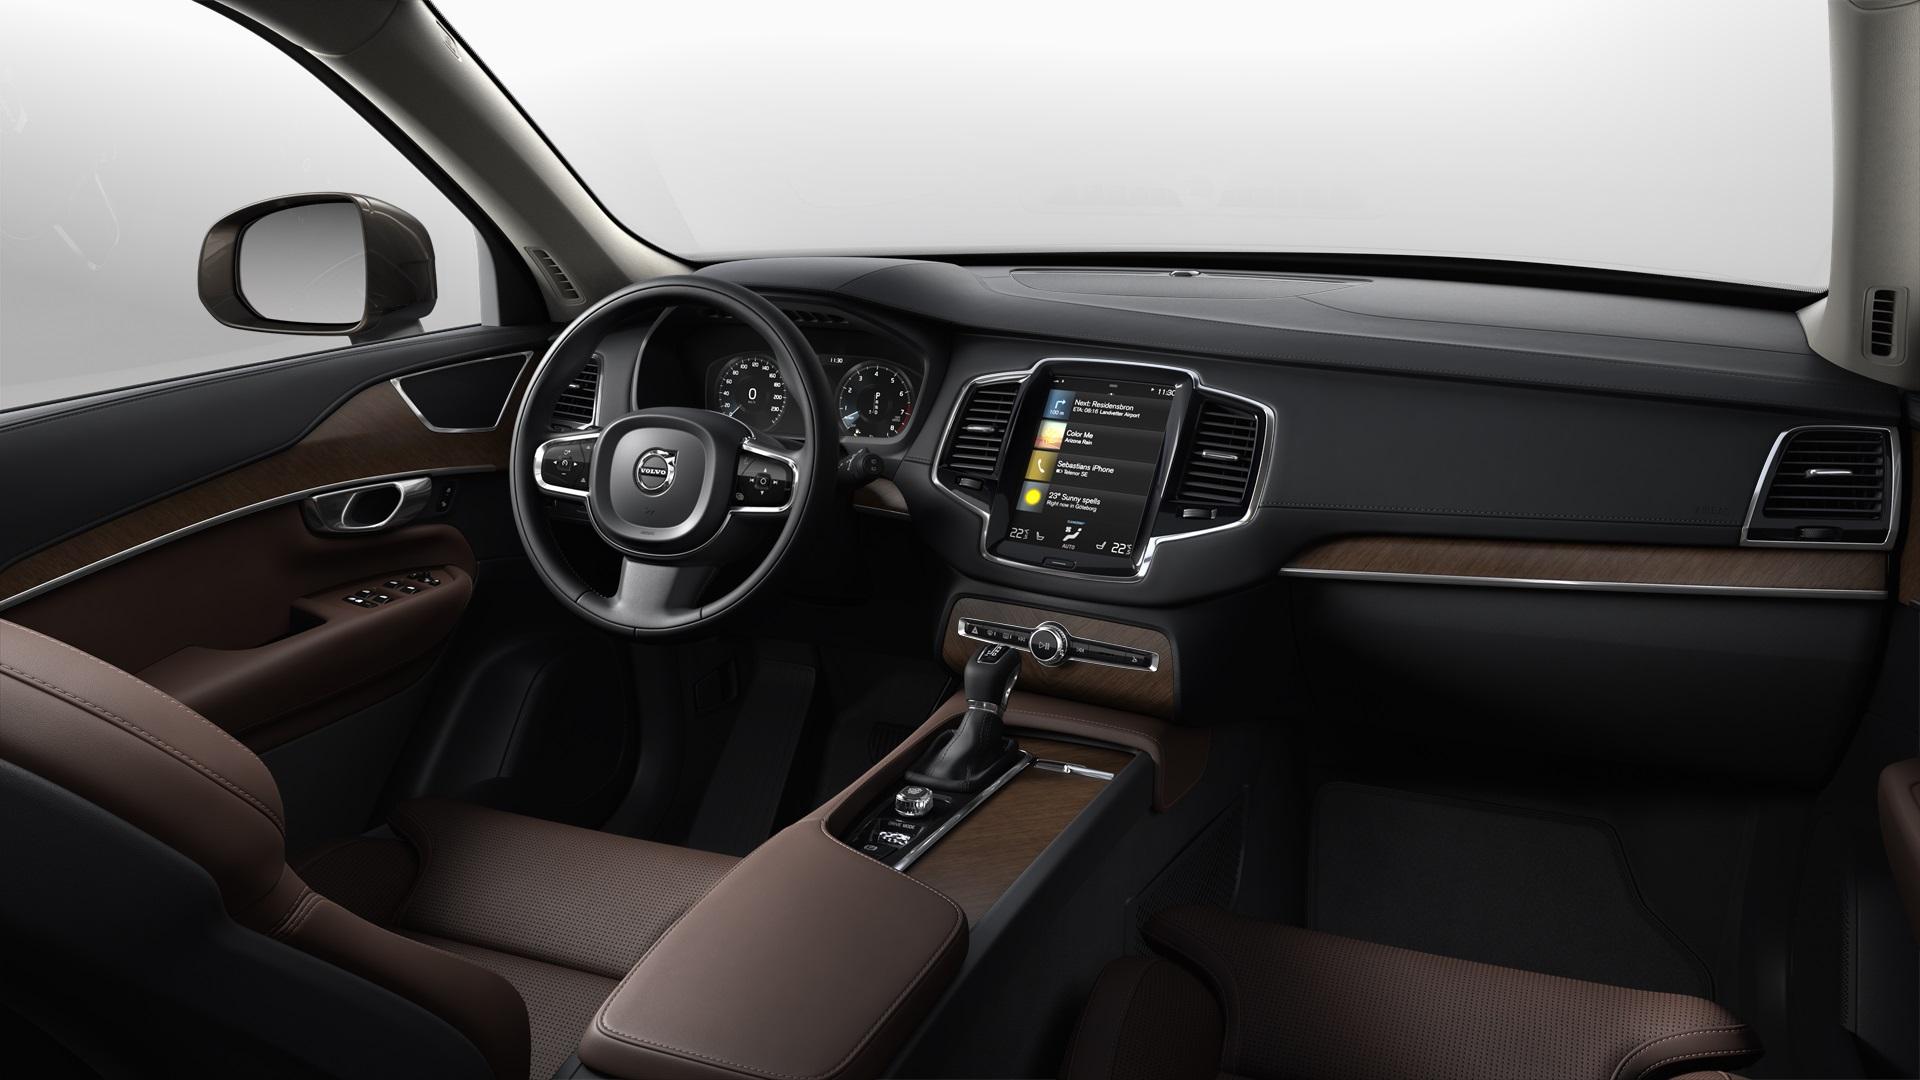 2020 Volvo XC90 Review - Carshighlight.com